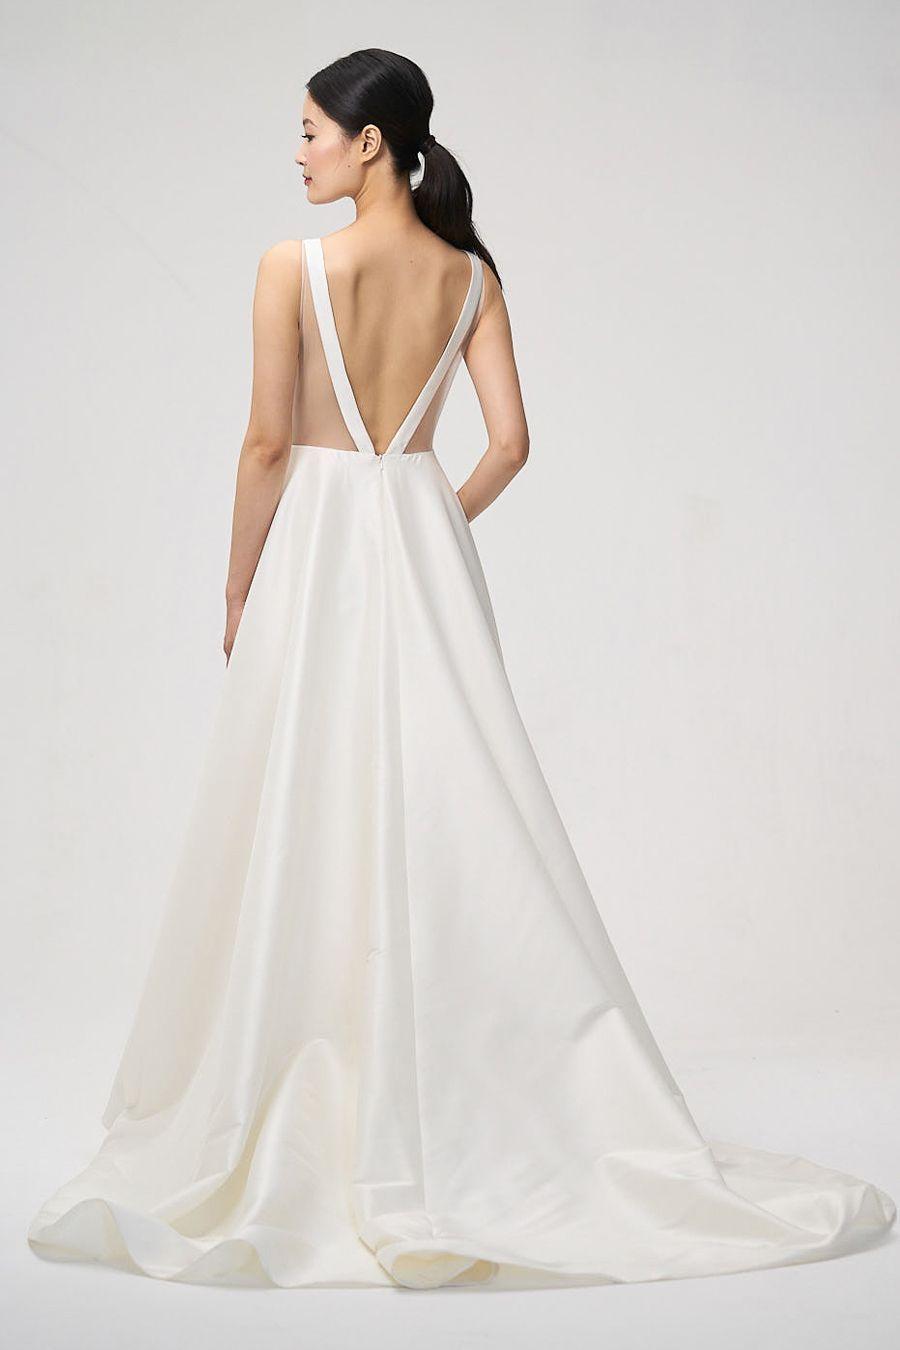 The Prettiest Wedding Ponytail Hairstyles Wedding Dress Shopping